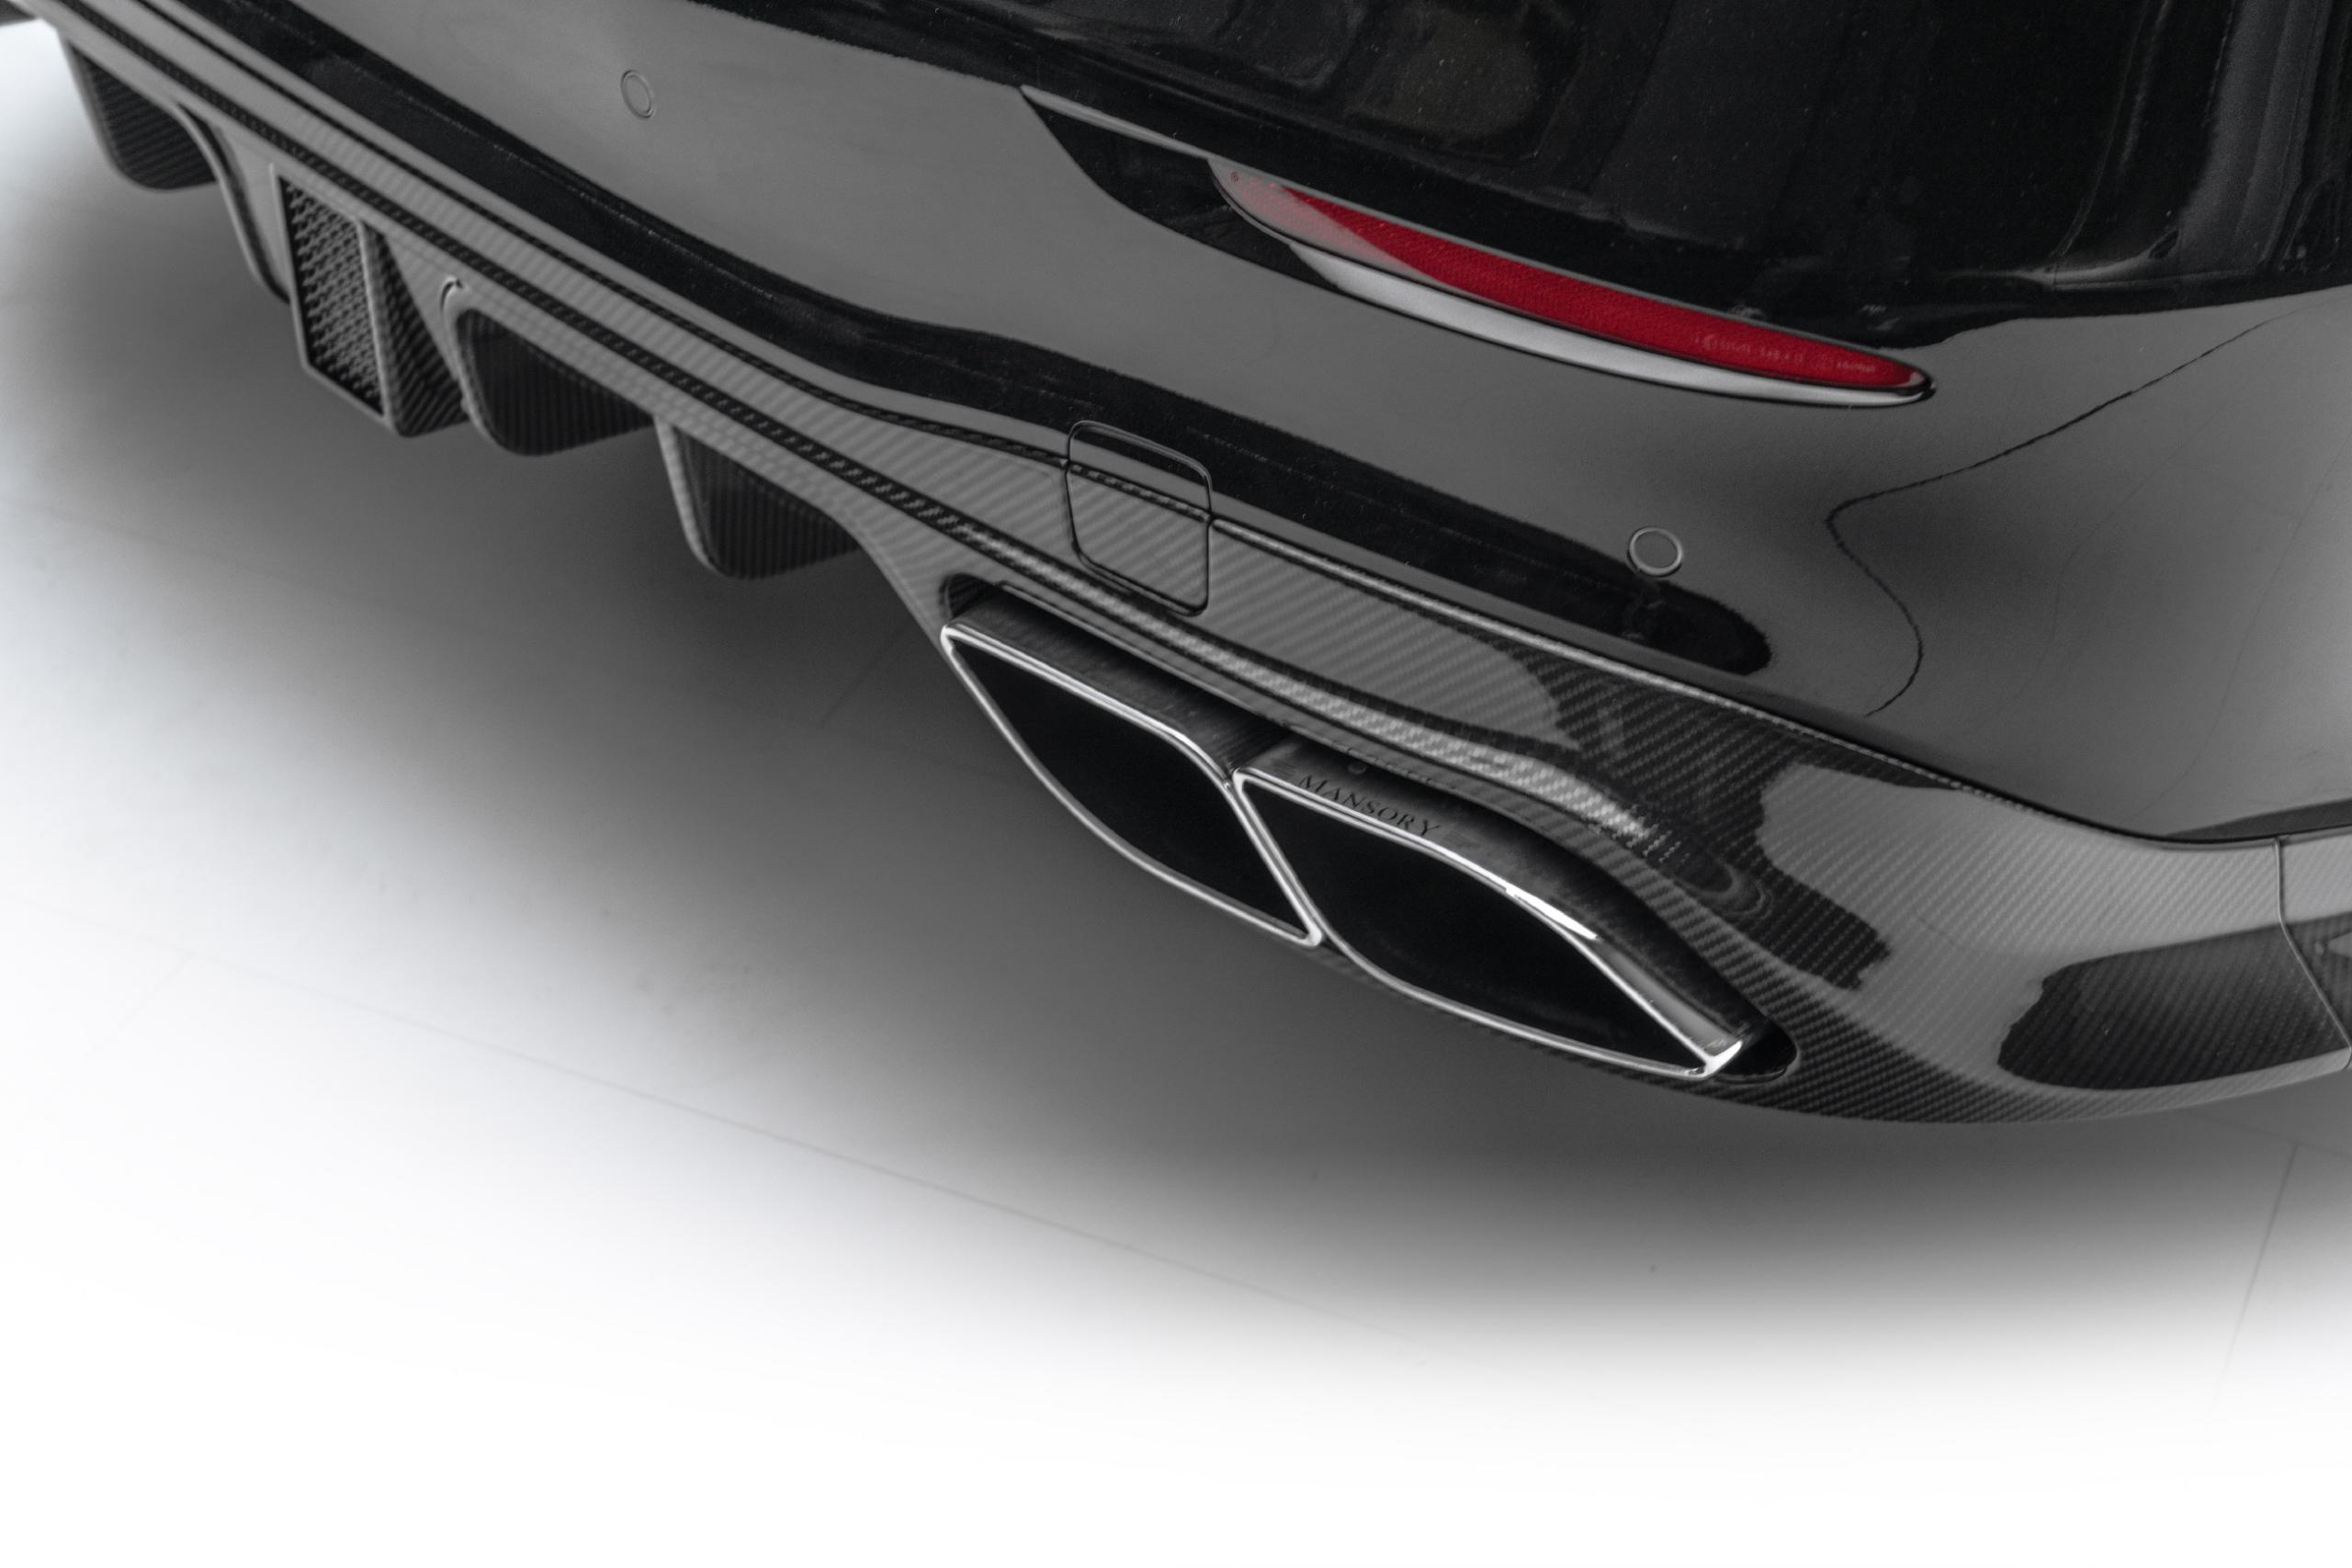 mansory w223 mercedes s class body kit carbon fiber rear diffuser exhaust blind tips set 2021 2022 2023